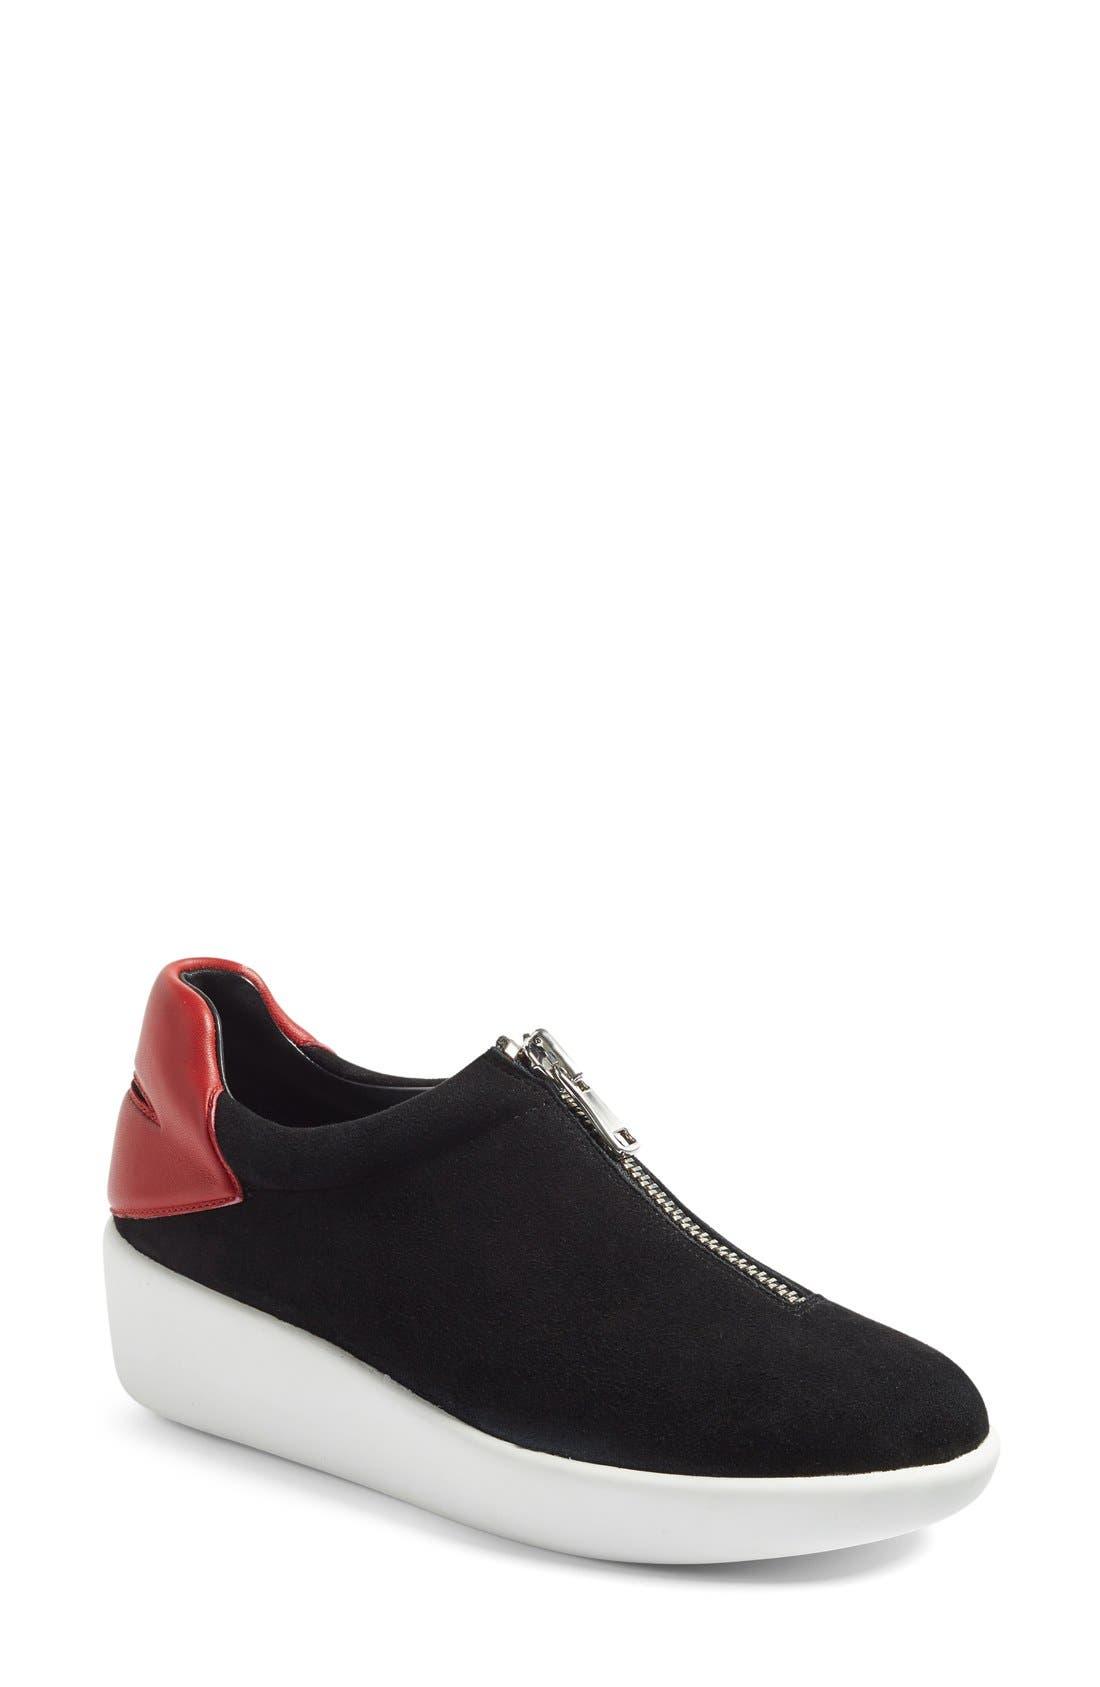 Alternate Image 1 Selected - Alice + Olivia 'Laney' Zip Platform Sneaker (Women)